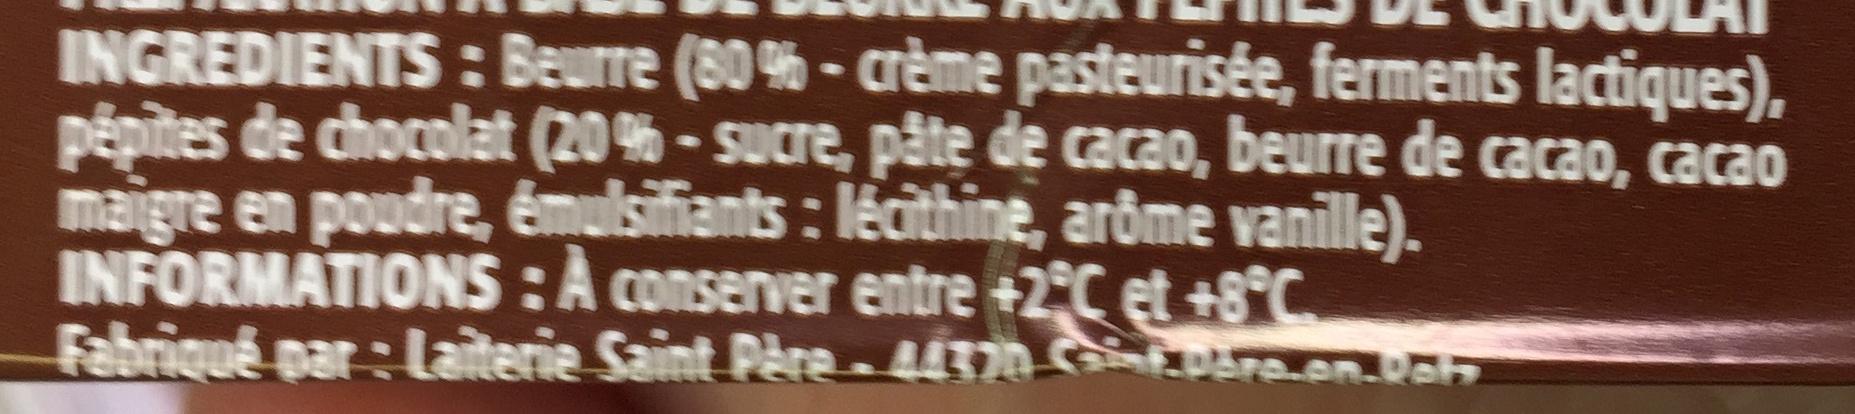 Pépites de Chocolat Tartine et Cuisine - Ingredients